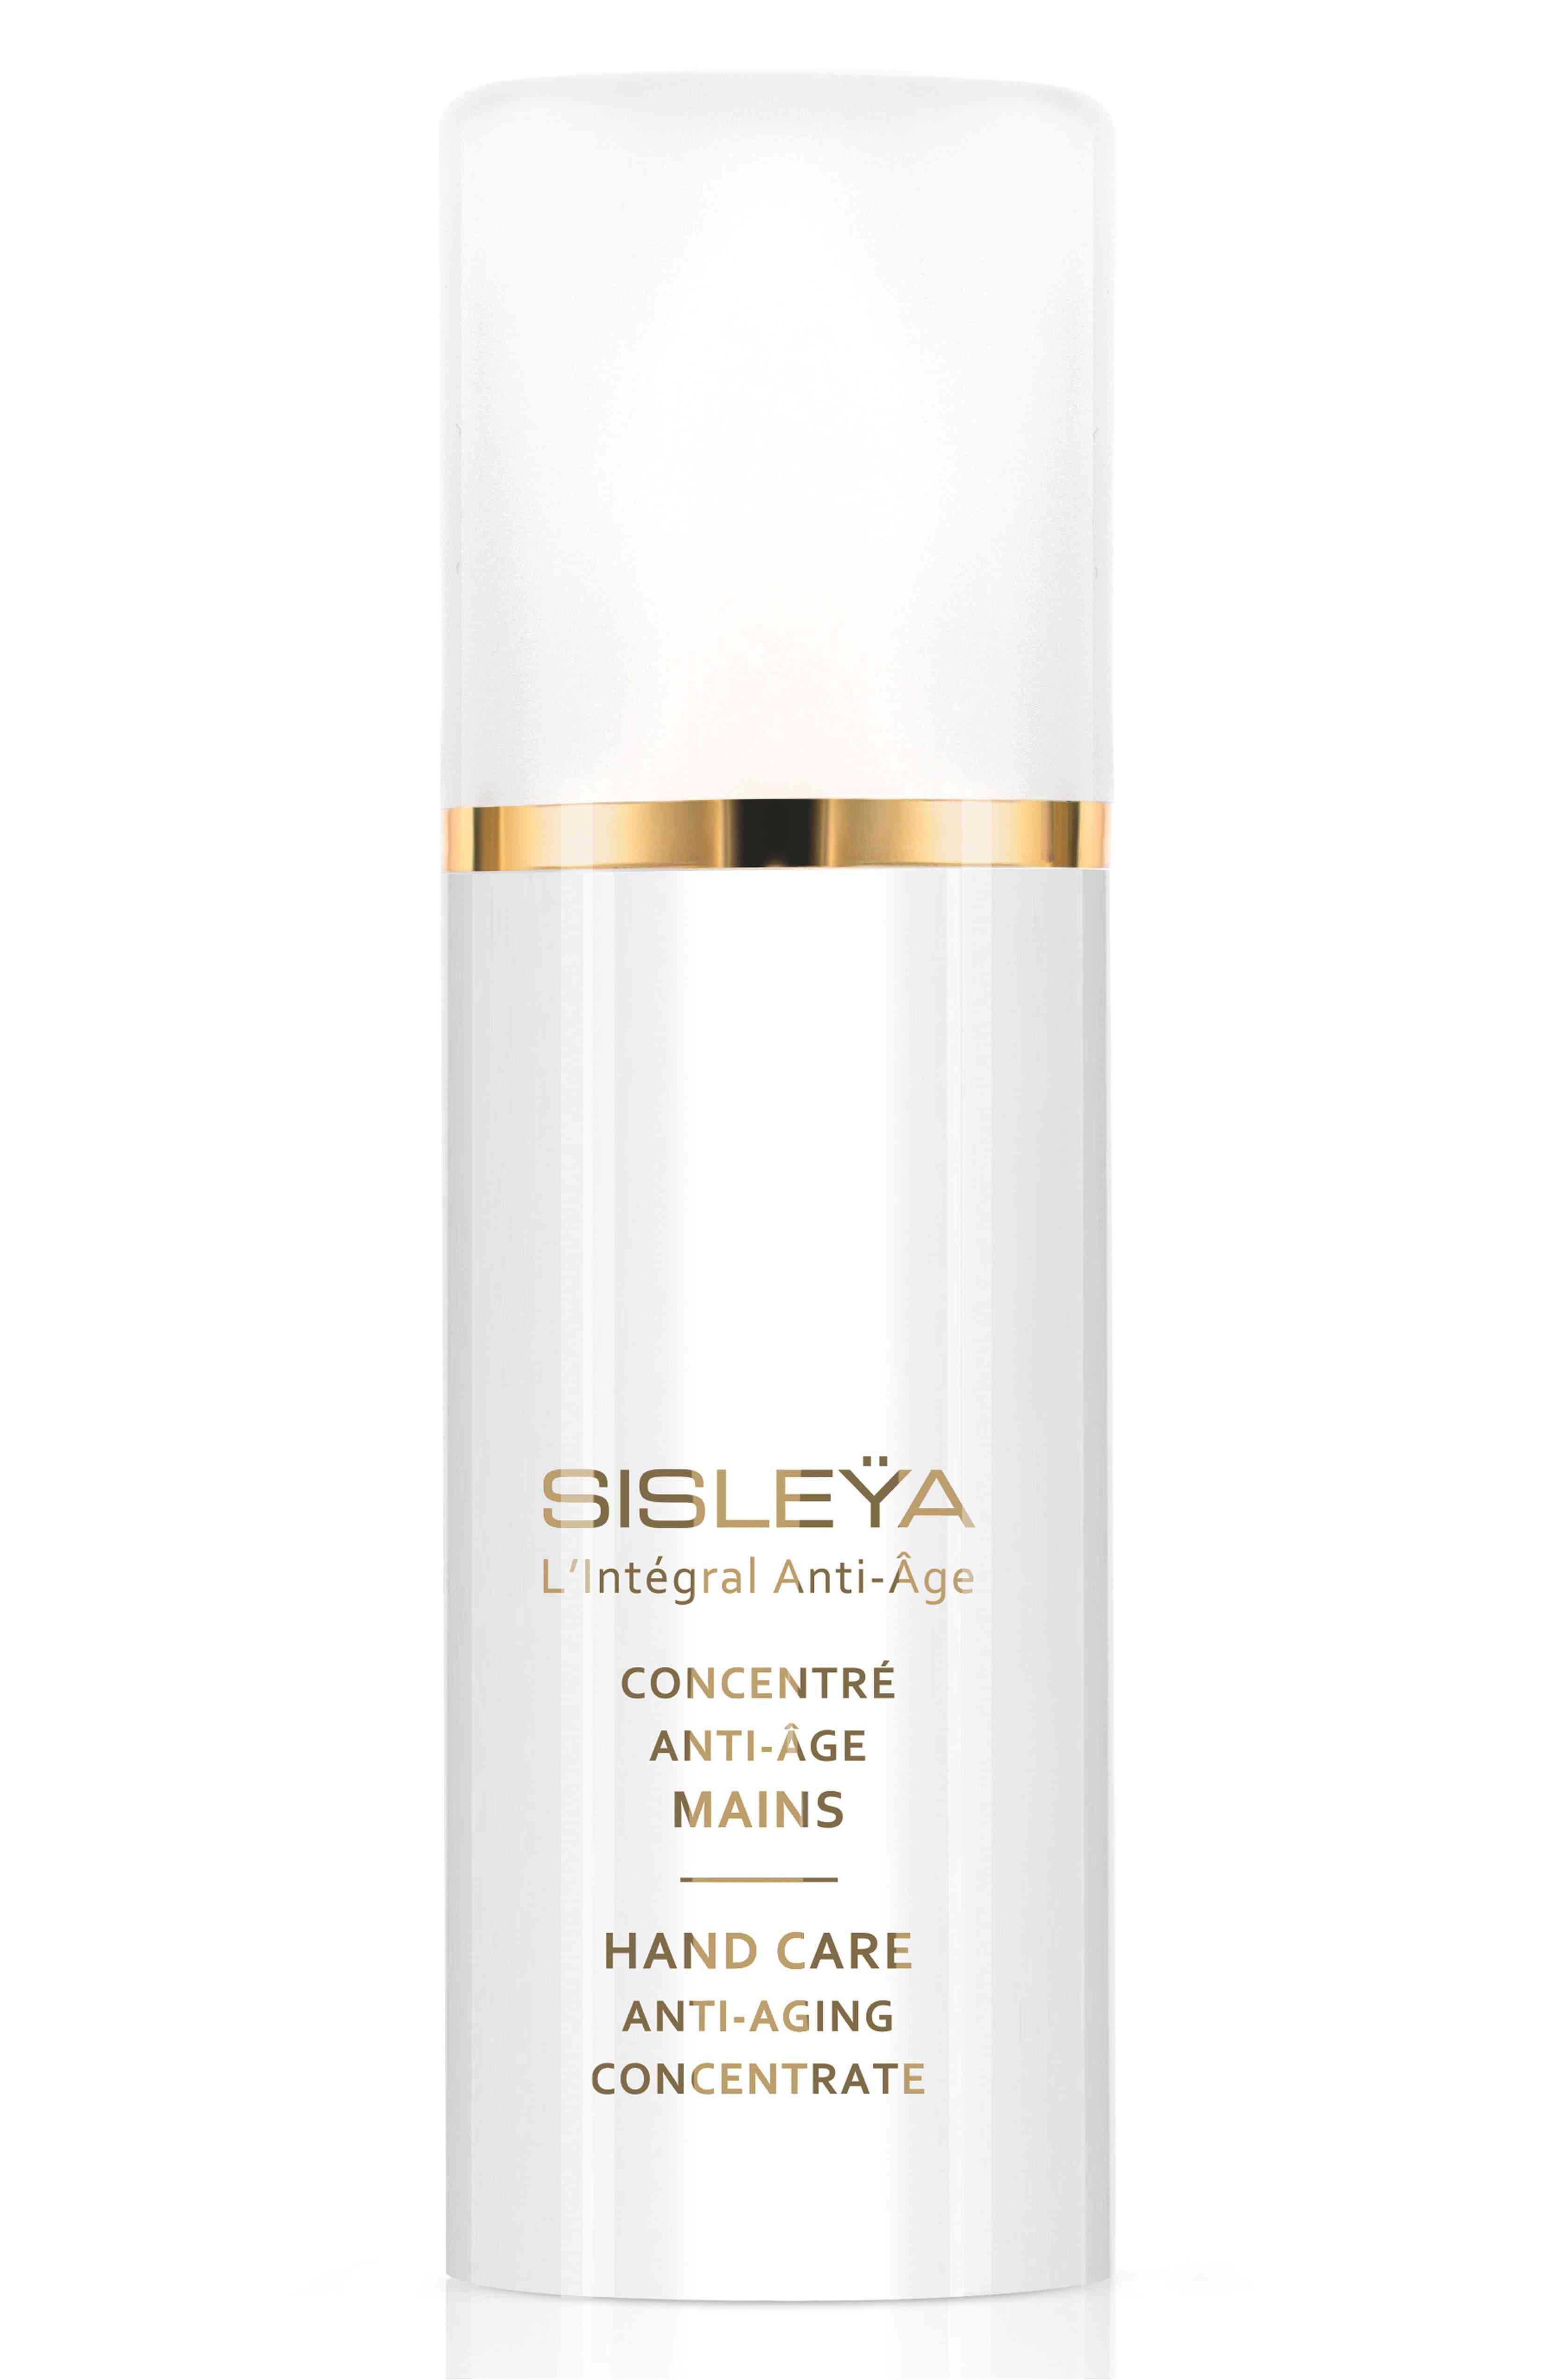 Sisley-Paris Sisleÿa L'Integral Anti-Age Hand Cream